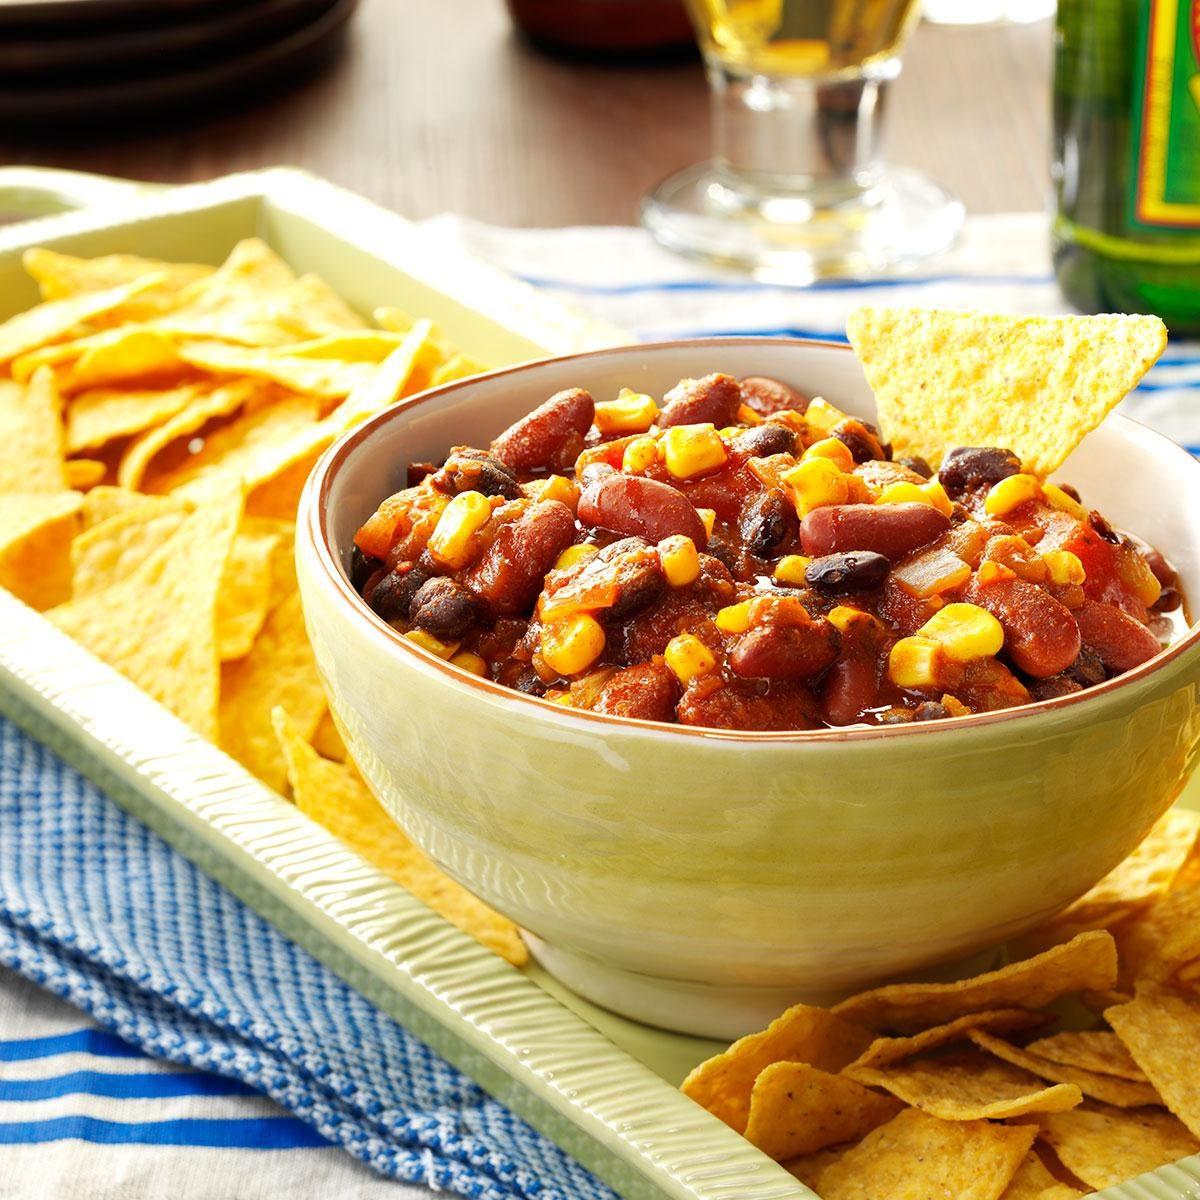 40 Easy Potluck Recipes For Your Graduation Party: Taco Joe Dip Recipe